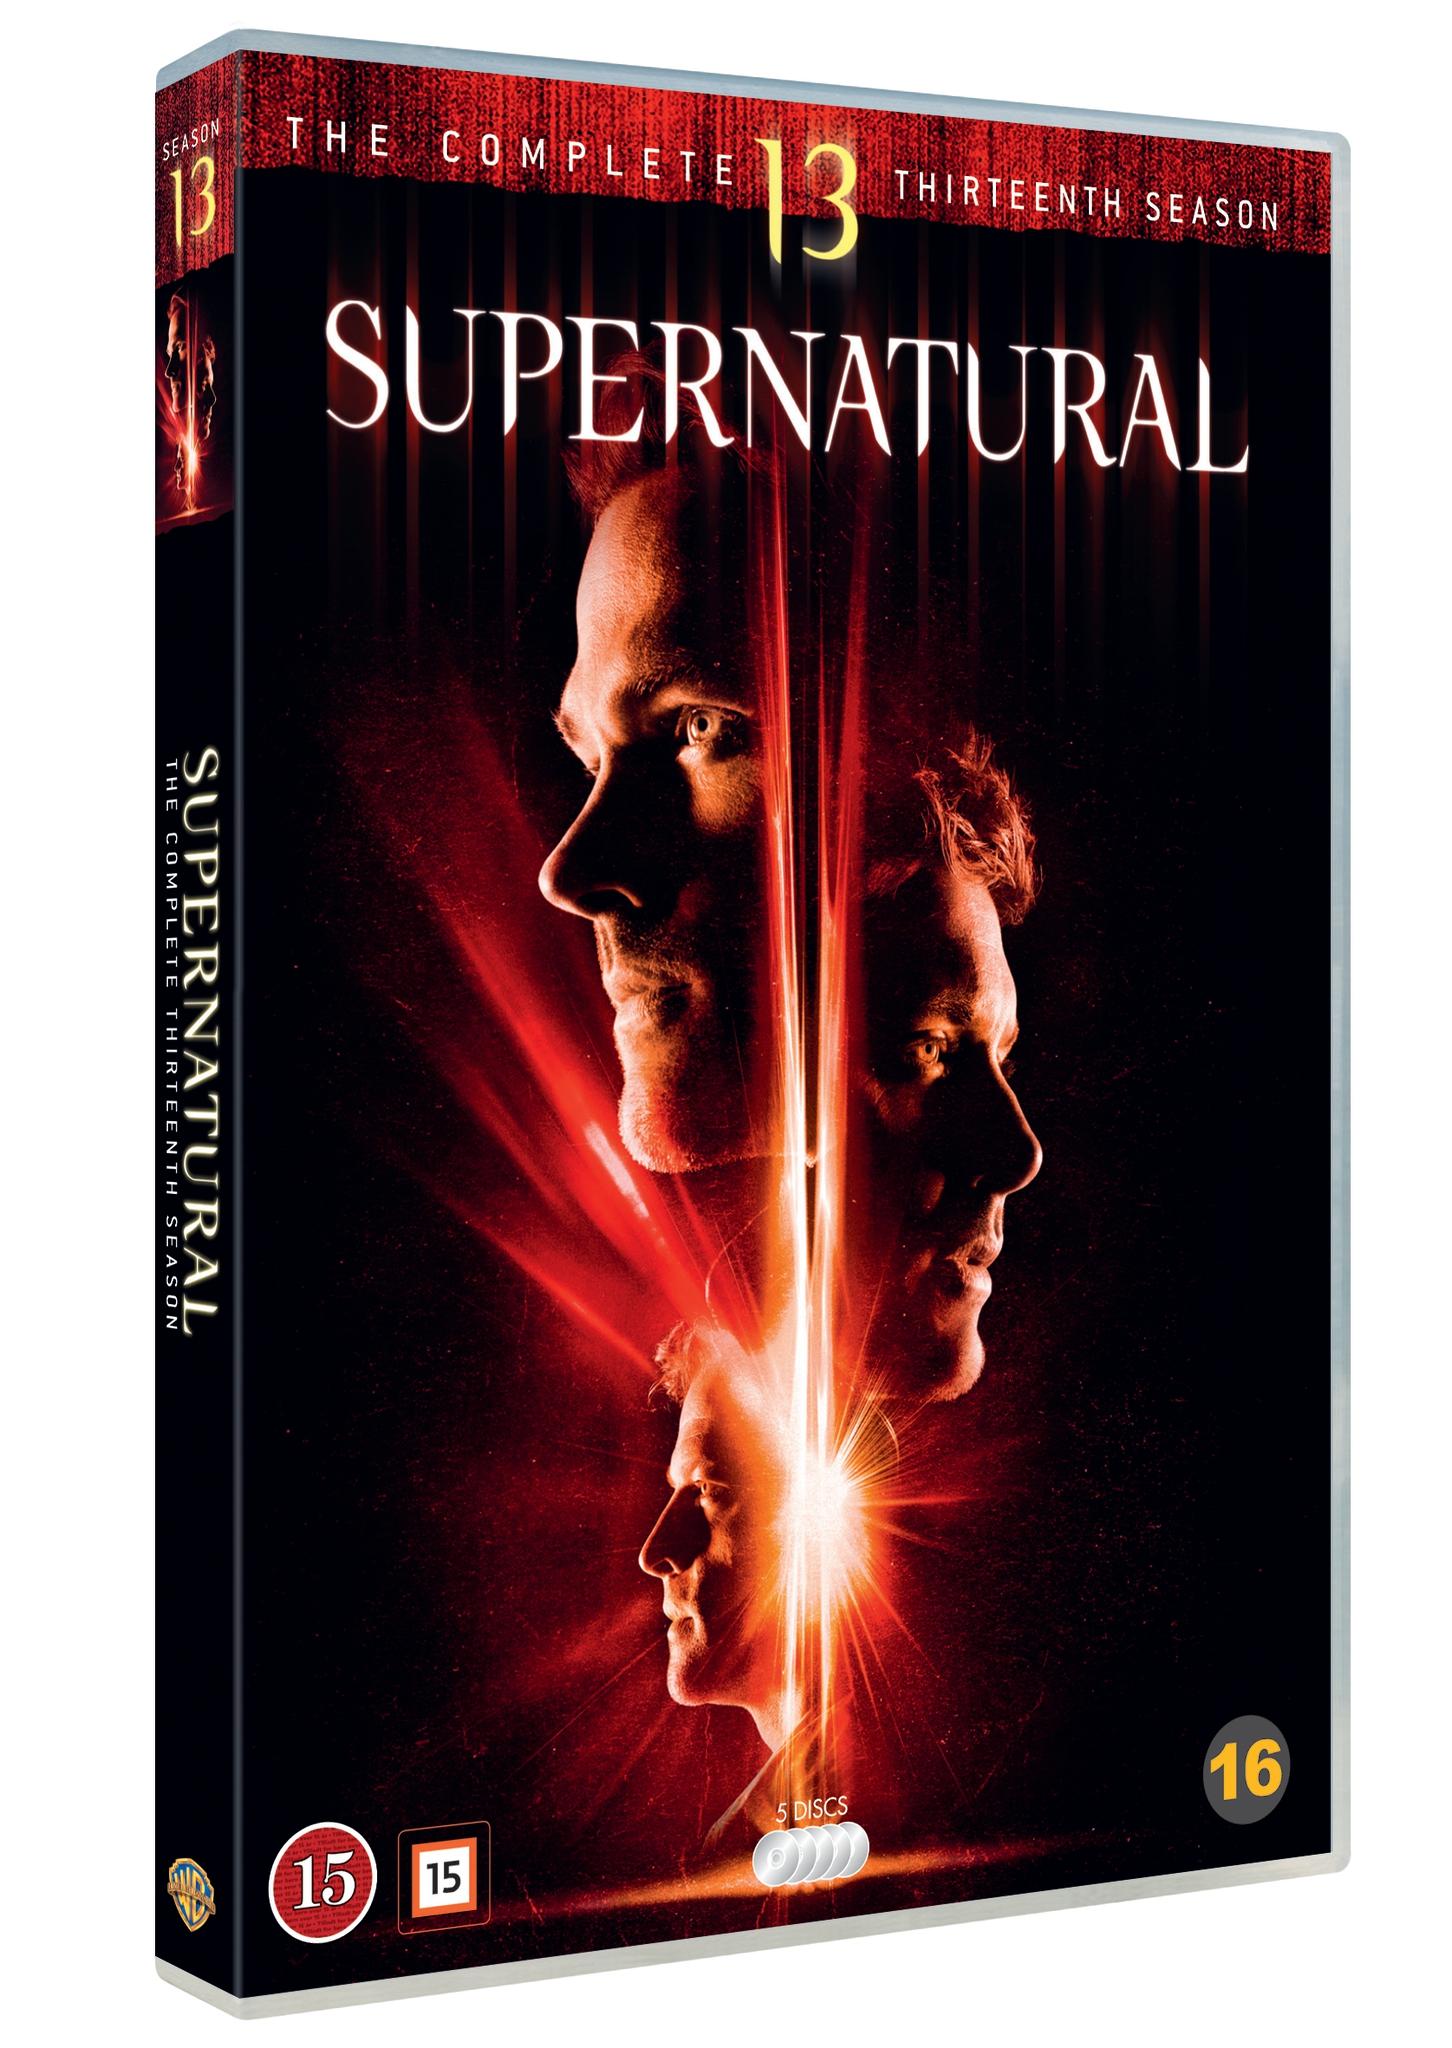 Supernatural S13- DVD